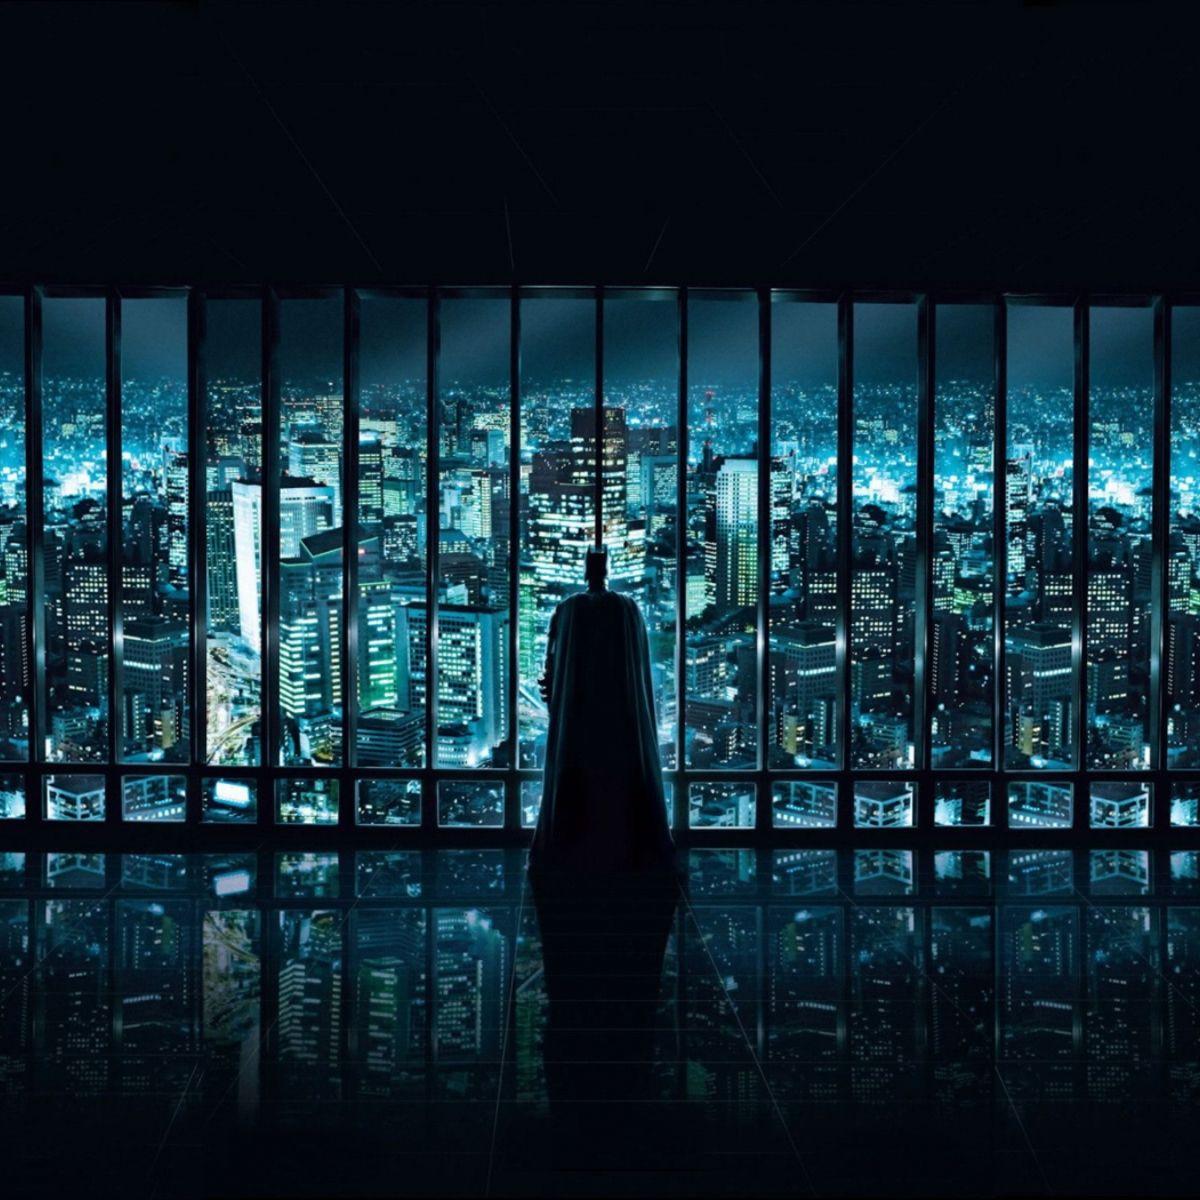 1492 Batman Looking At Gotham City Wallpaper Wallchan